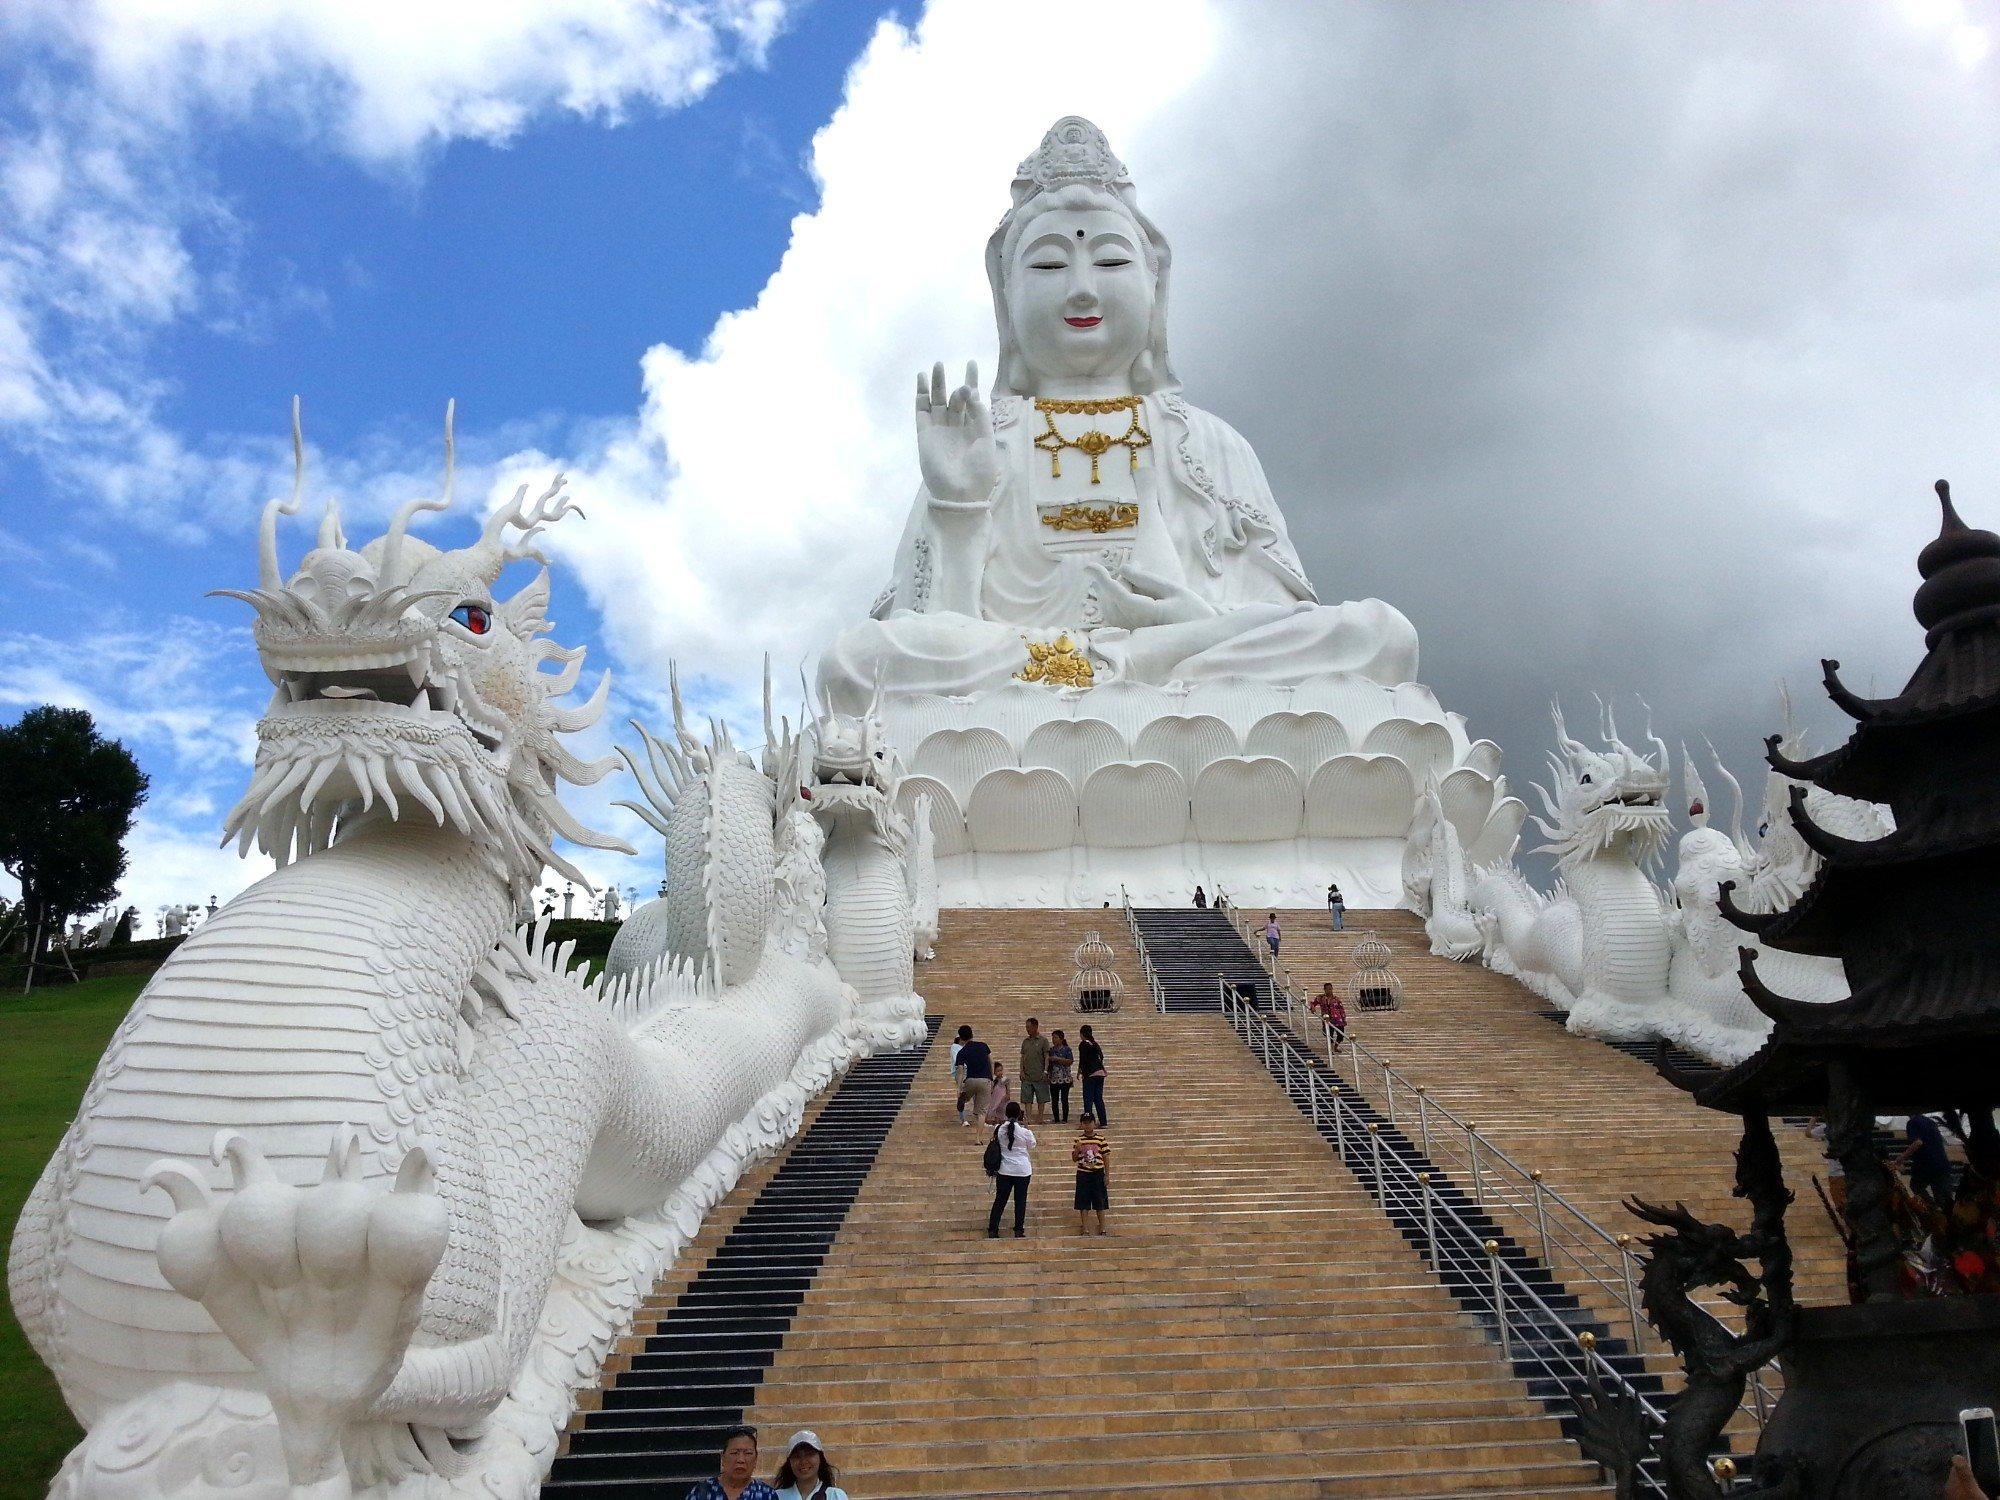 Stairs up to the Guan Yin statue at Wat Huay Pla Kang